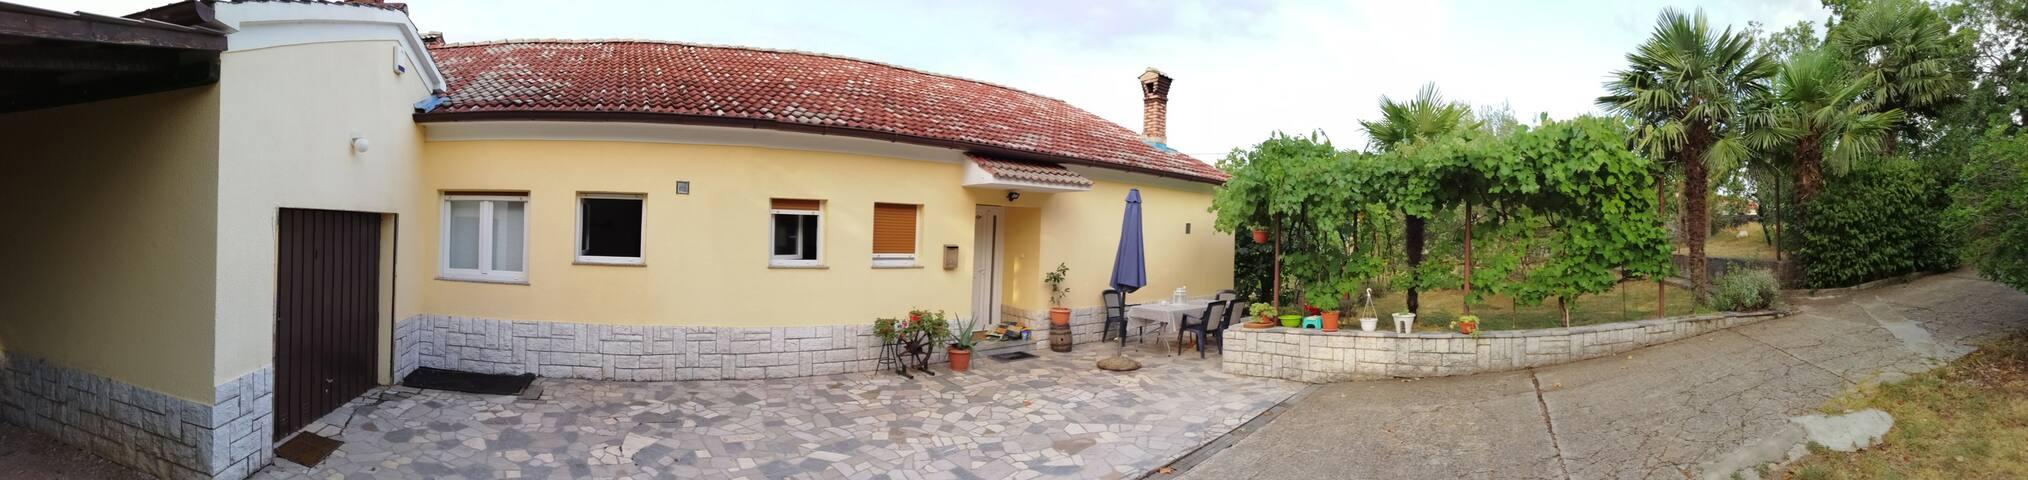 New studio apartment Vigo-Rijeka, Opatija, Kastav